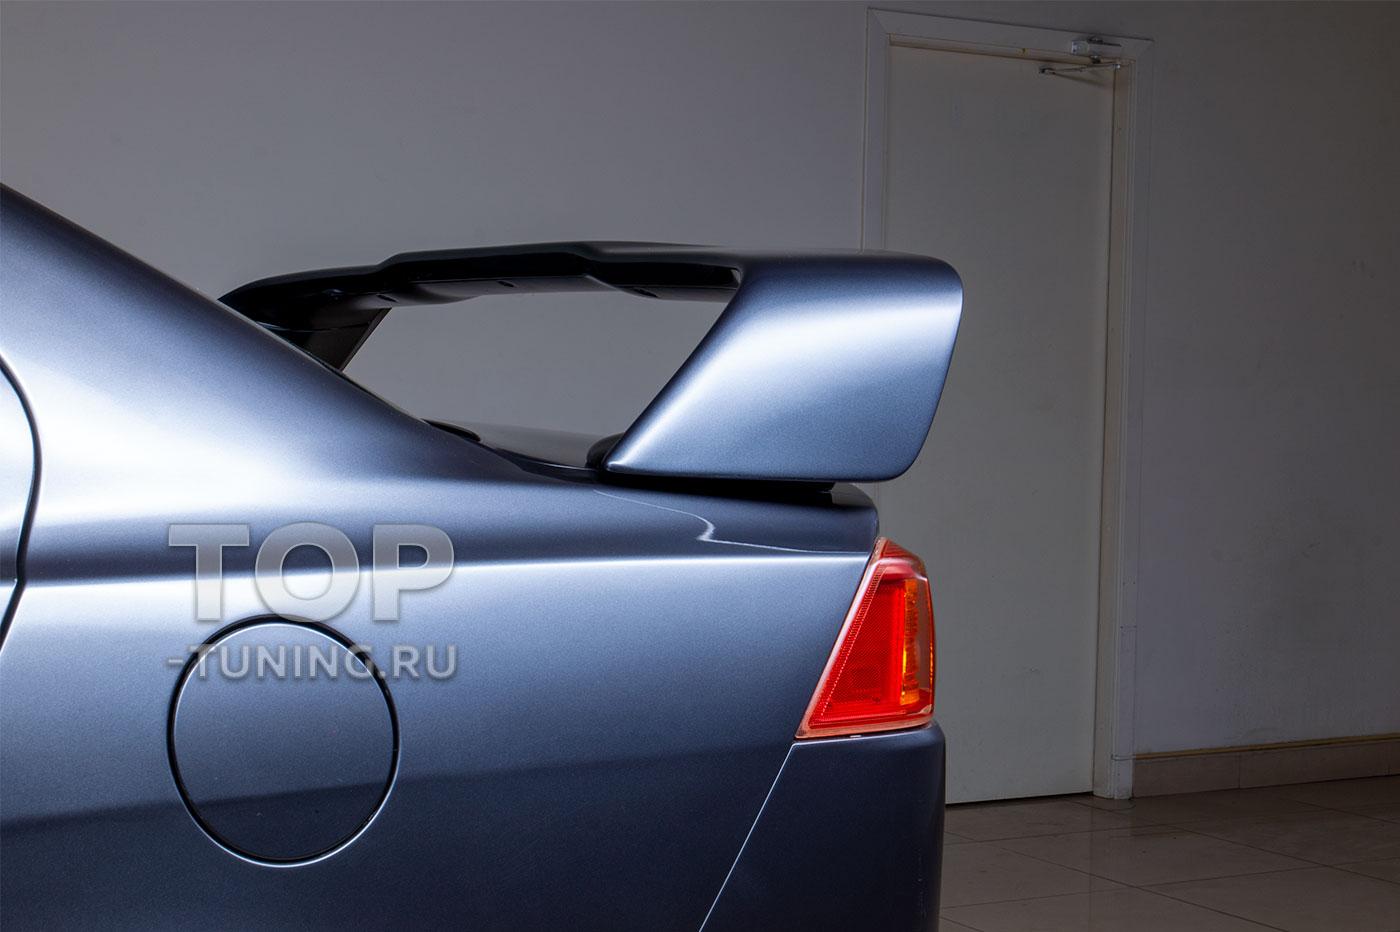 4582 Спойлер Evolution (ABS) на Mitsubishi Lancer 10 (X)